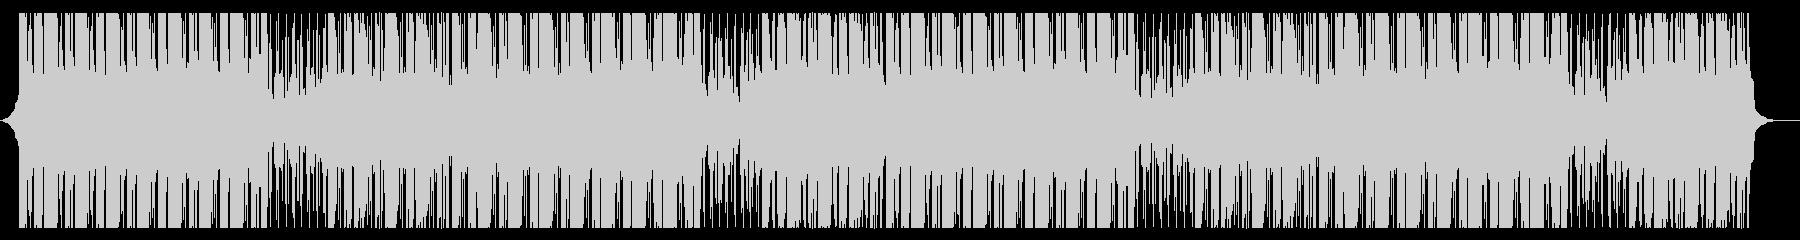 FutureBass風BGMの未再生の波形